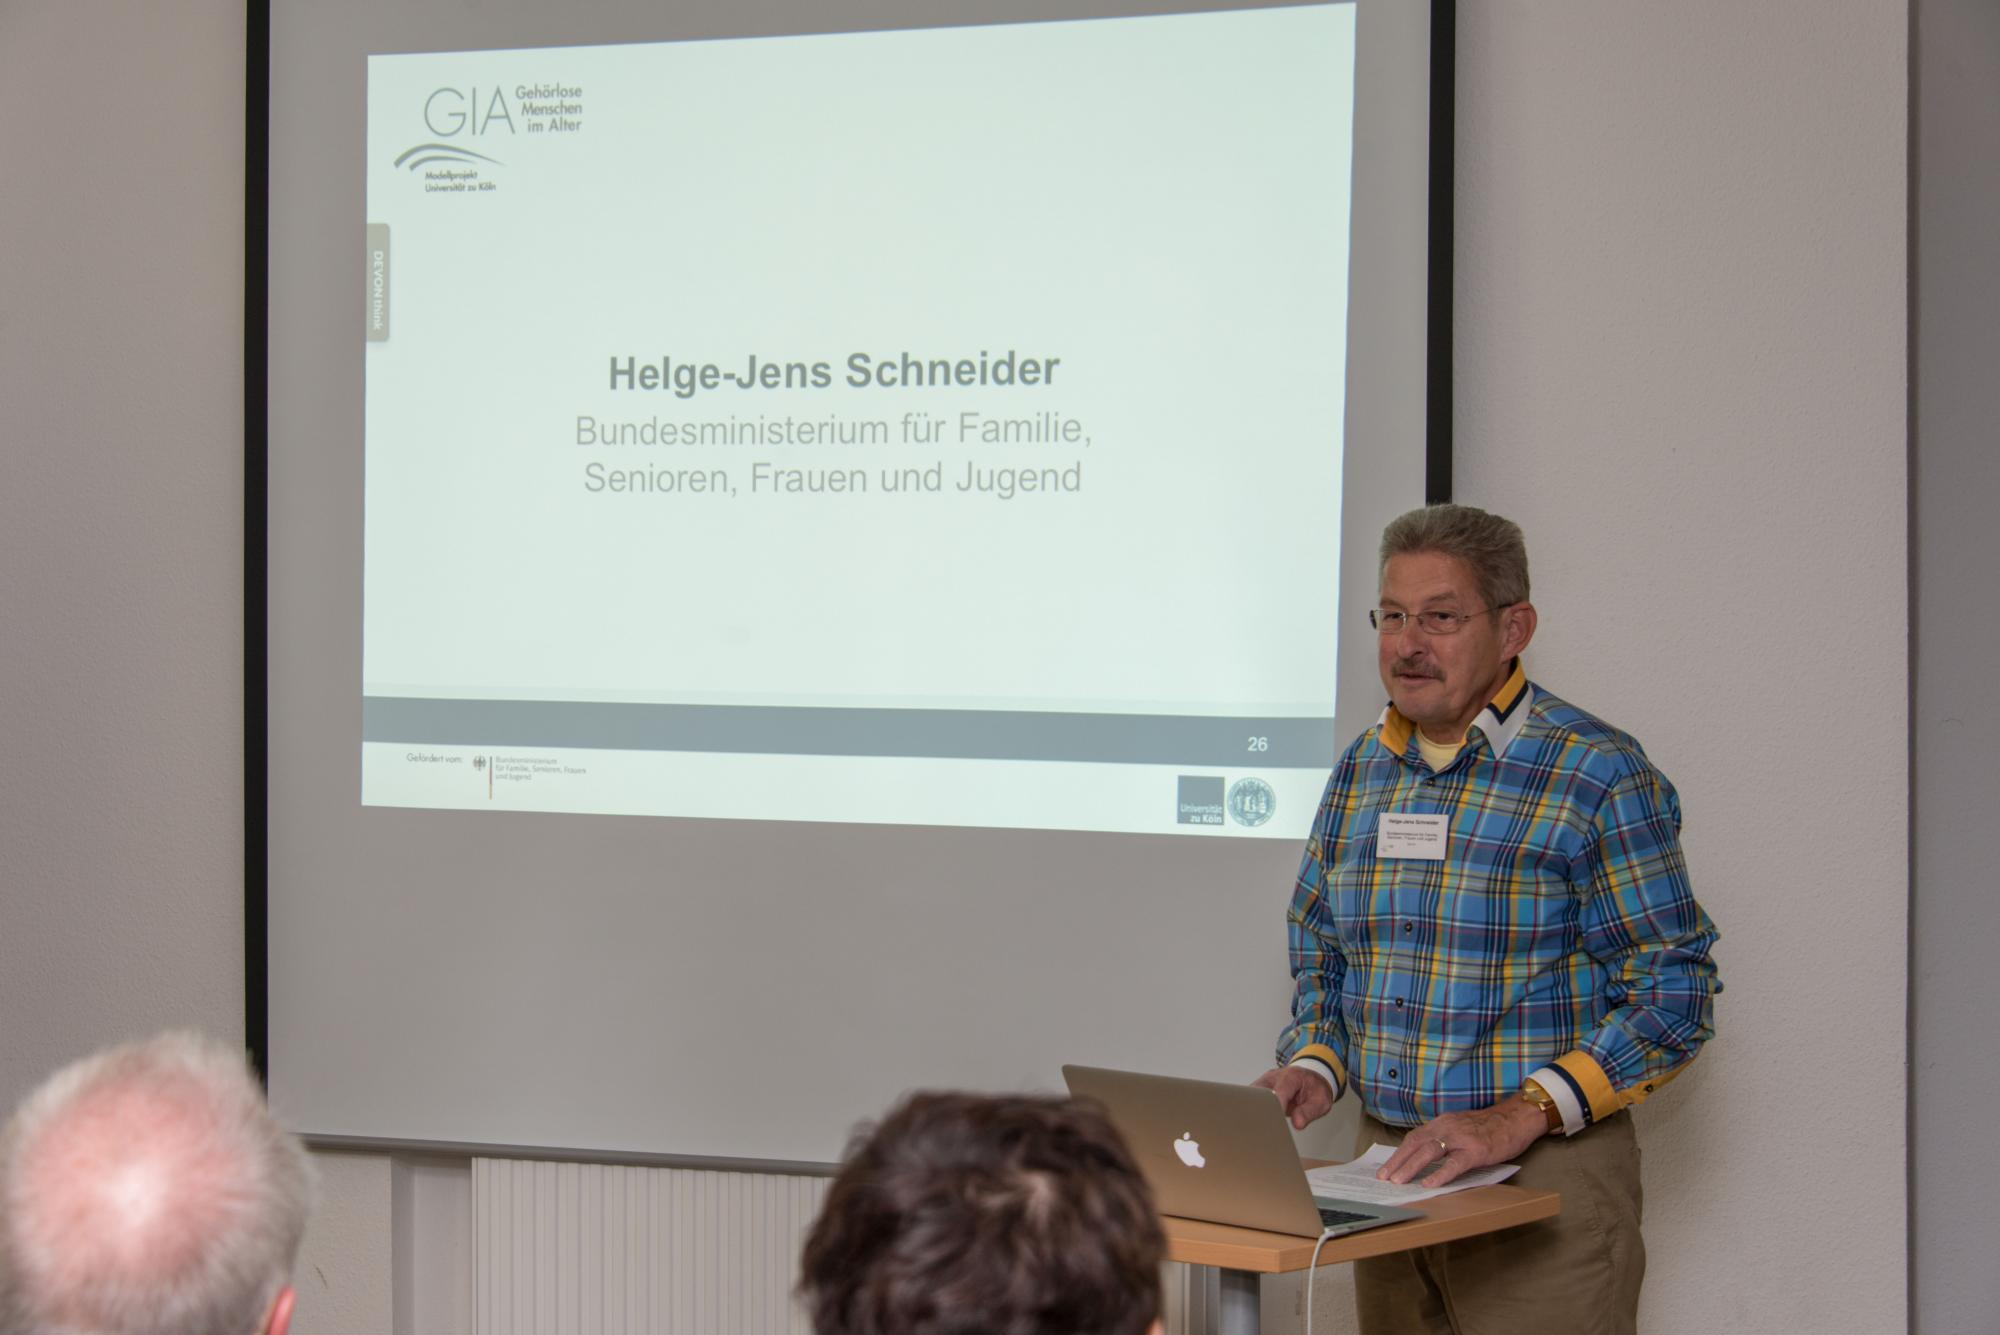 Helge-Jens Schneider